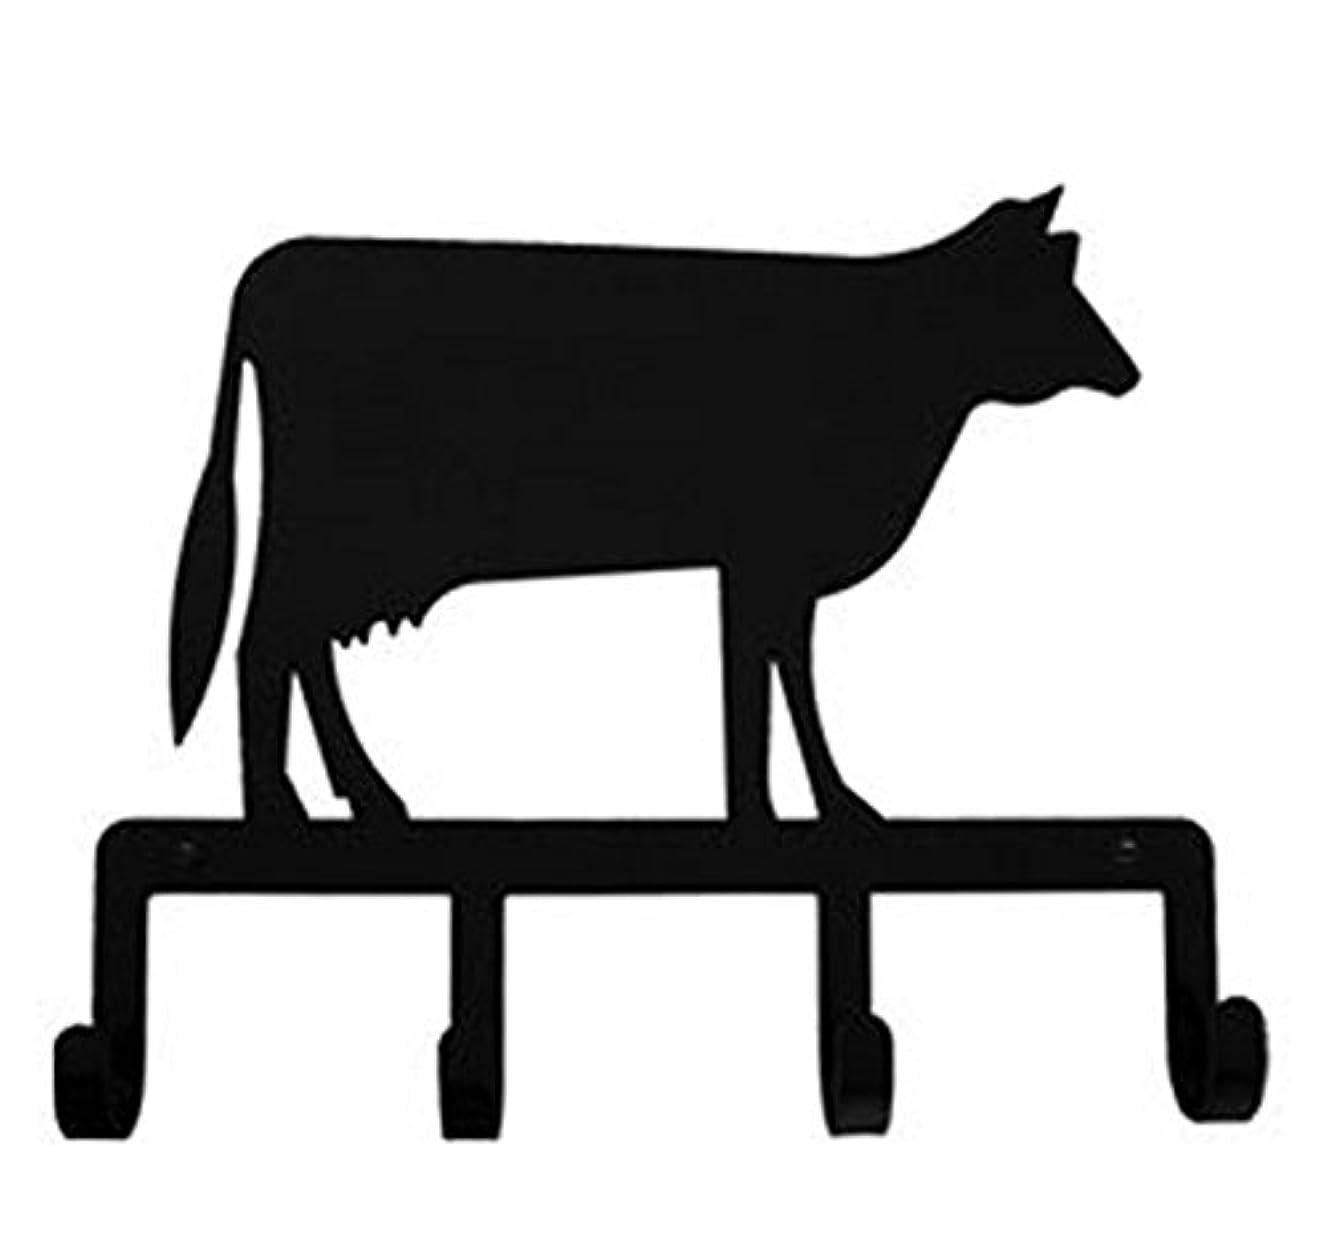 Iron Cow Key Rack - Jewelry Holder - Pet Leash Hanger - Heavy Duty Metal Keychain Car Key Holder, Key Hooks, Key Hanger, Key Organizers